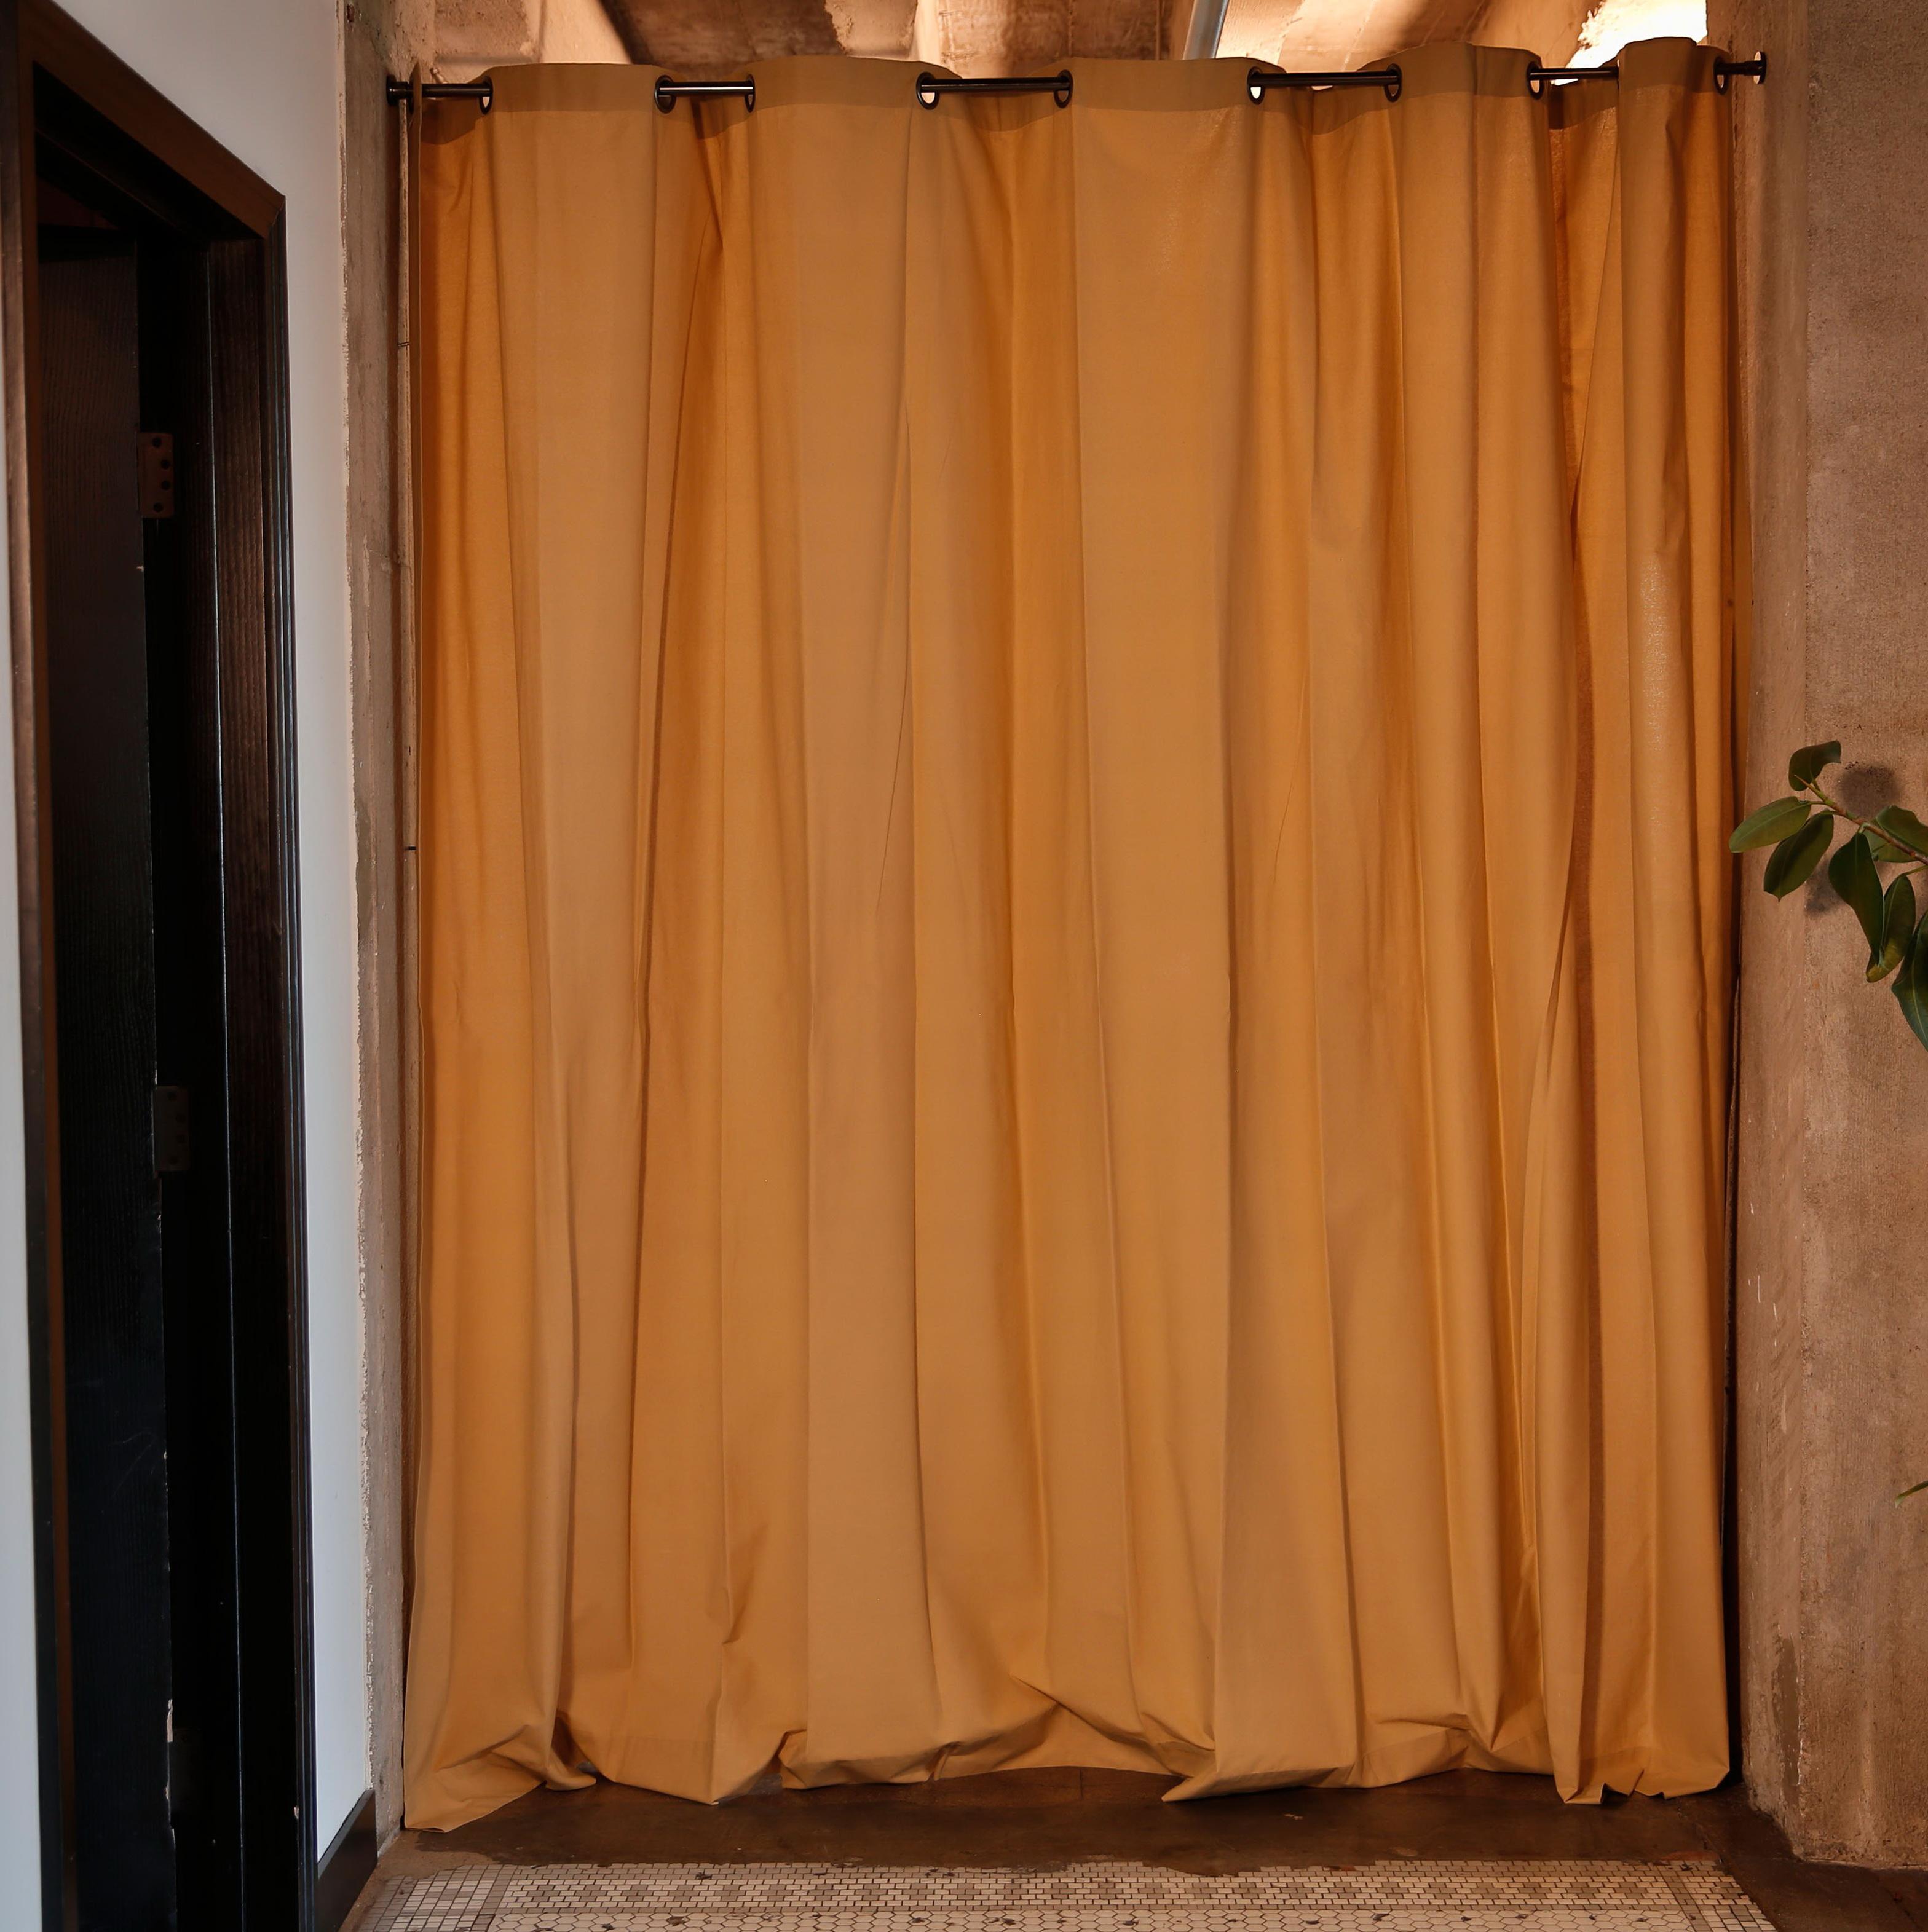 Curtain wall dividers